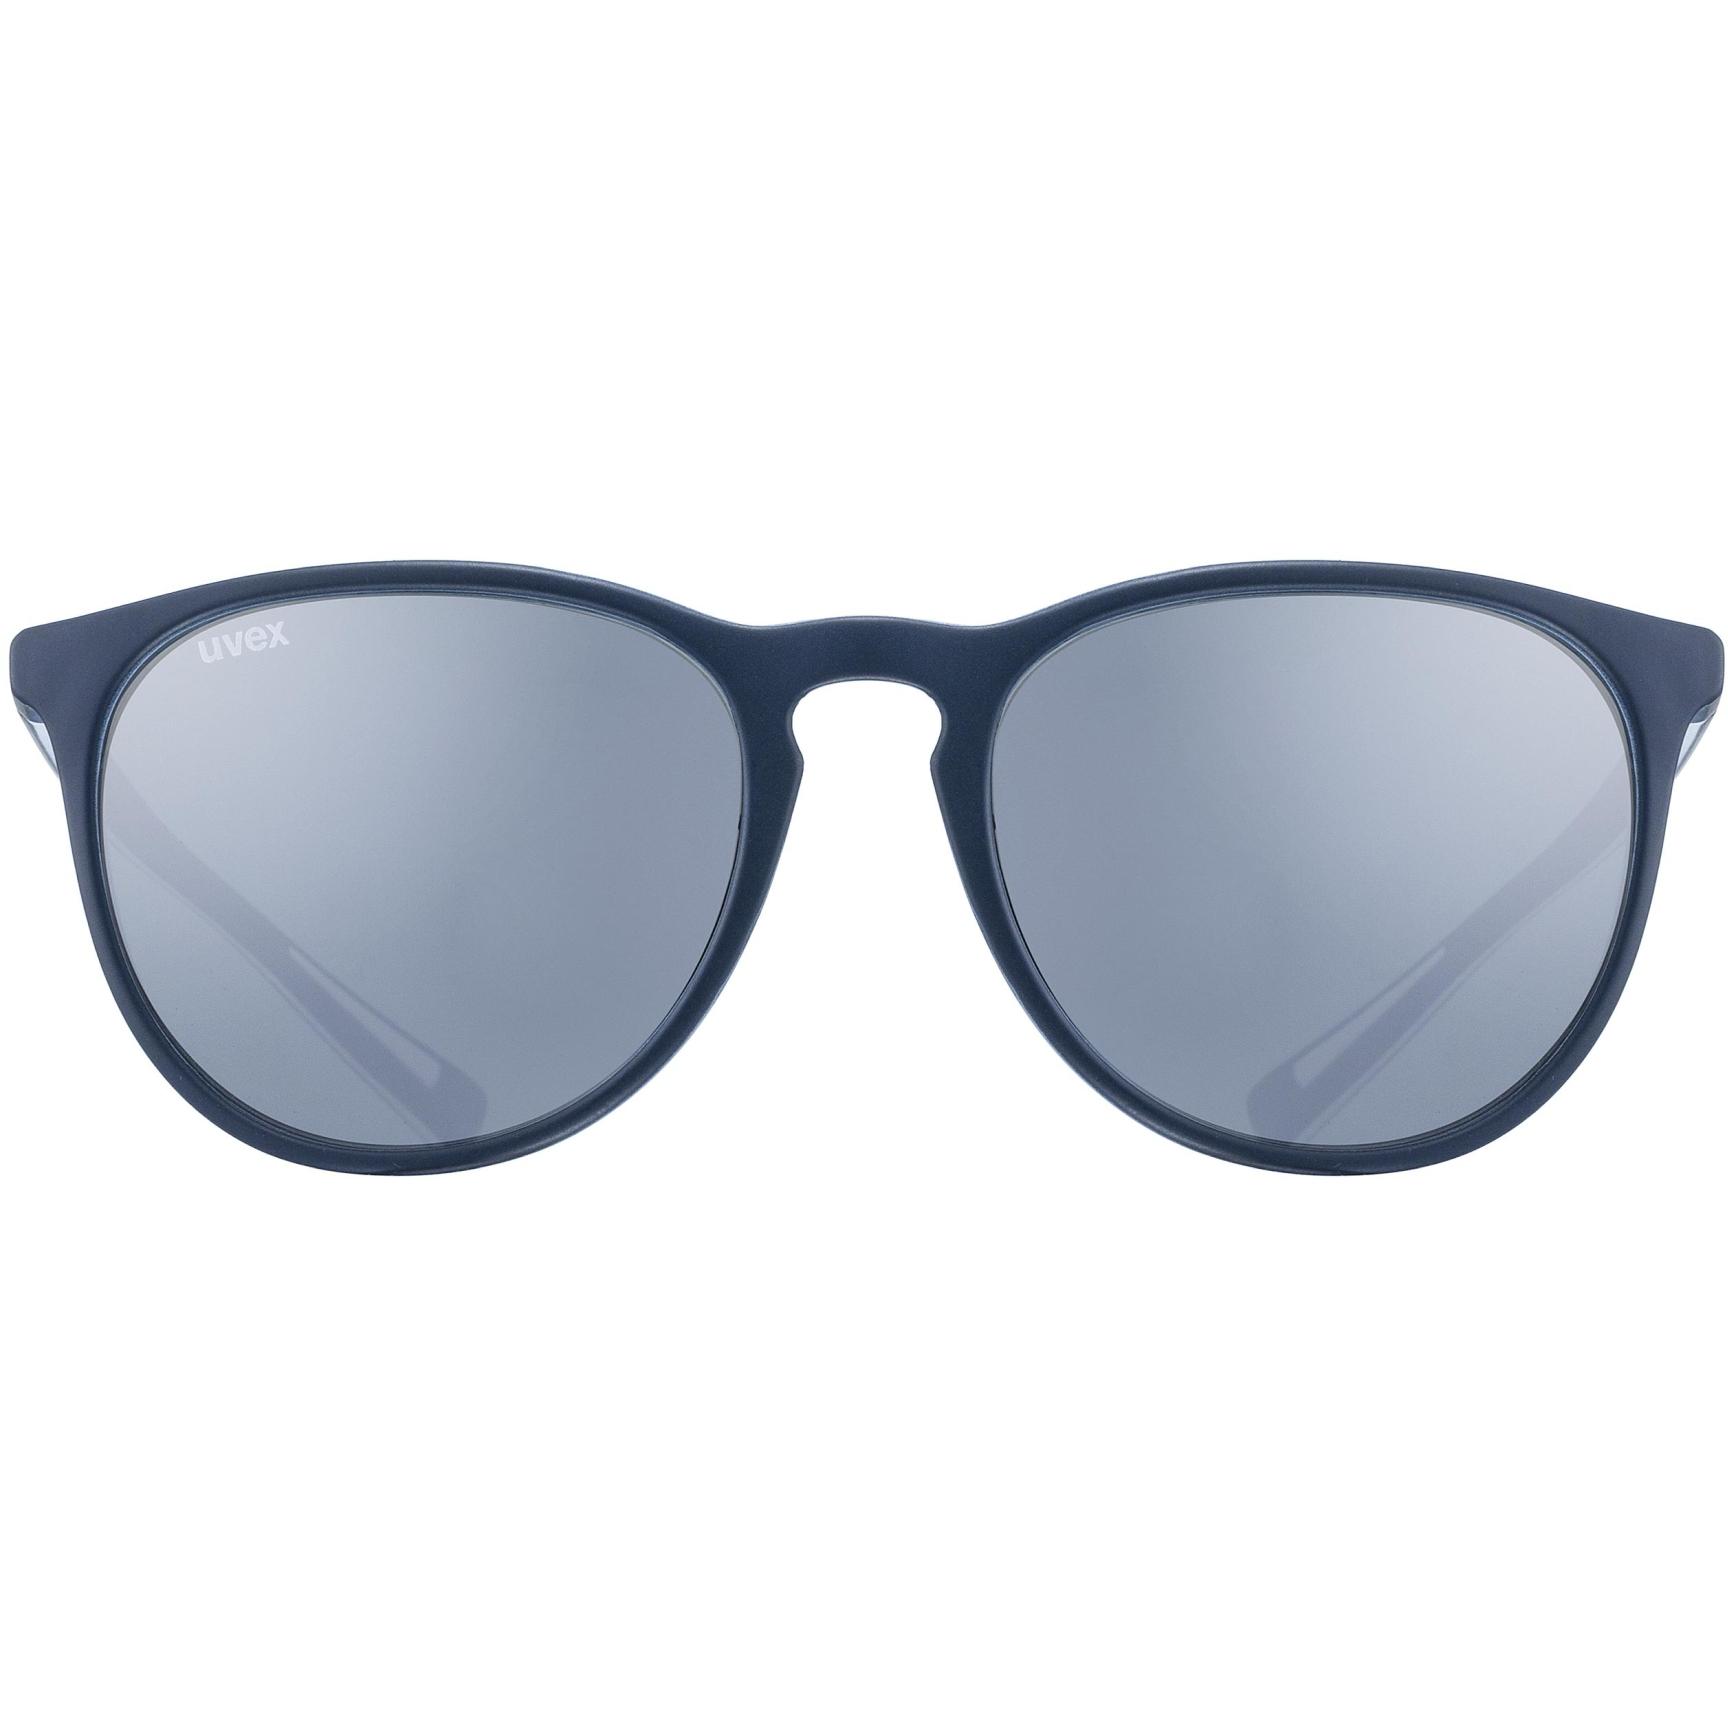 Image of Uvex lgl 43 Glasses - blue mat/litemirror silver